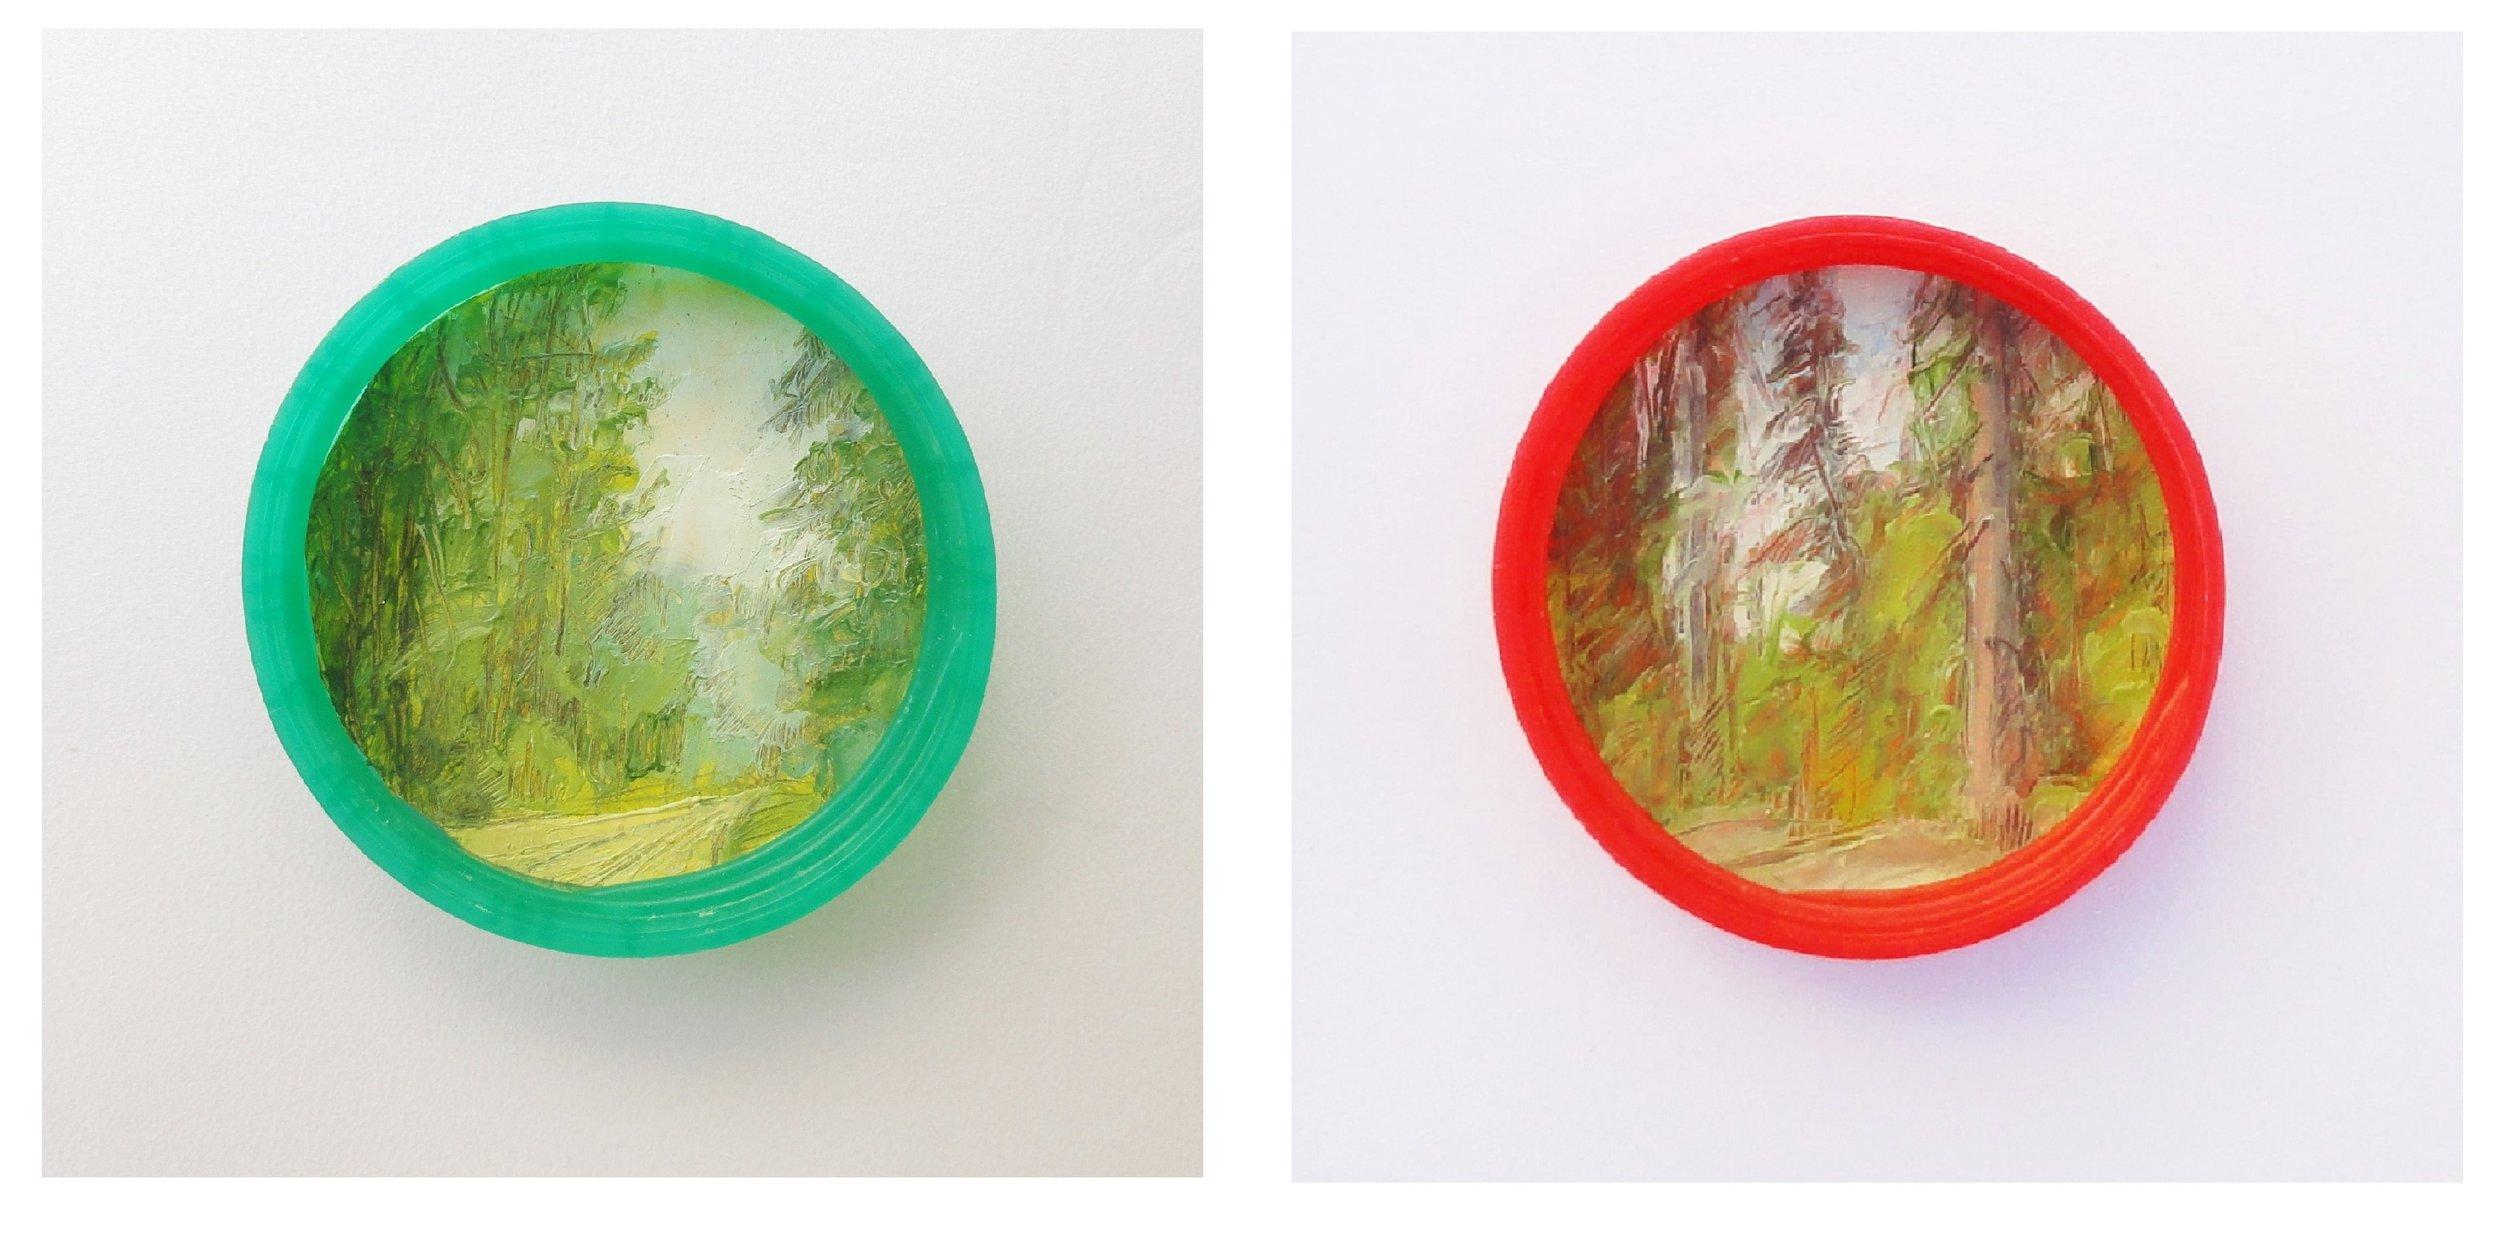 Inguna Gremzde, Small World, 2012 - Ongoing, Detail View